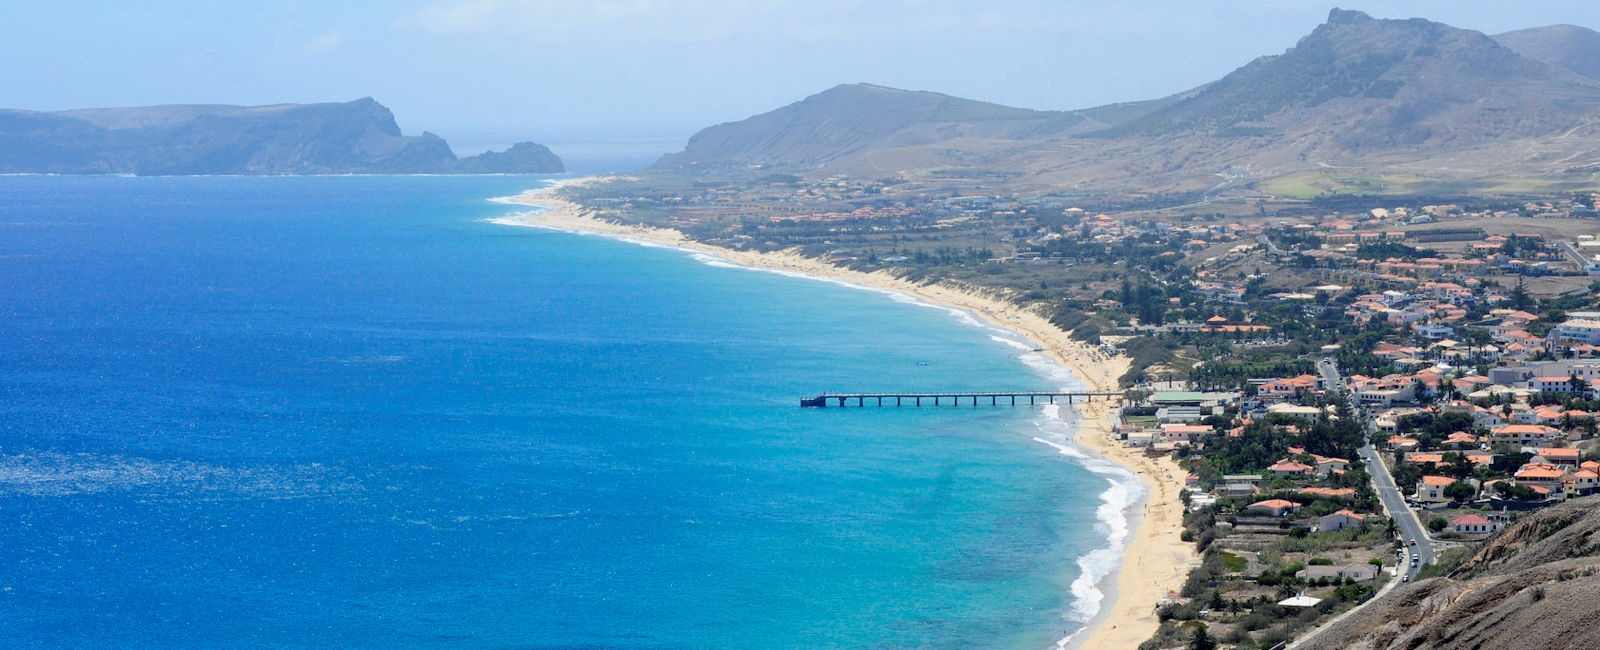 Luxury Porto Santo Island Holidays 2